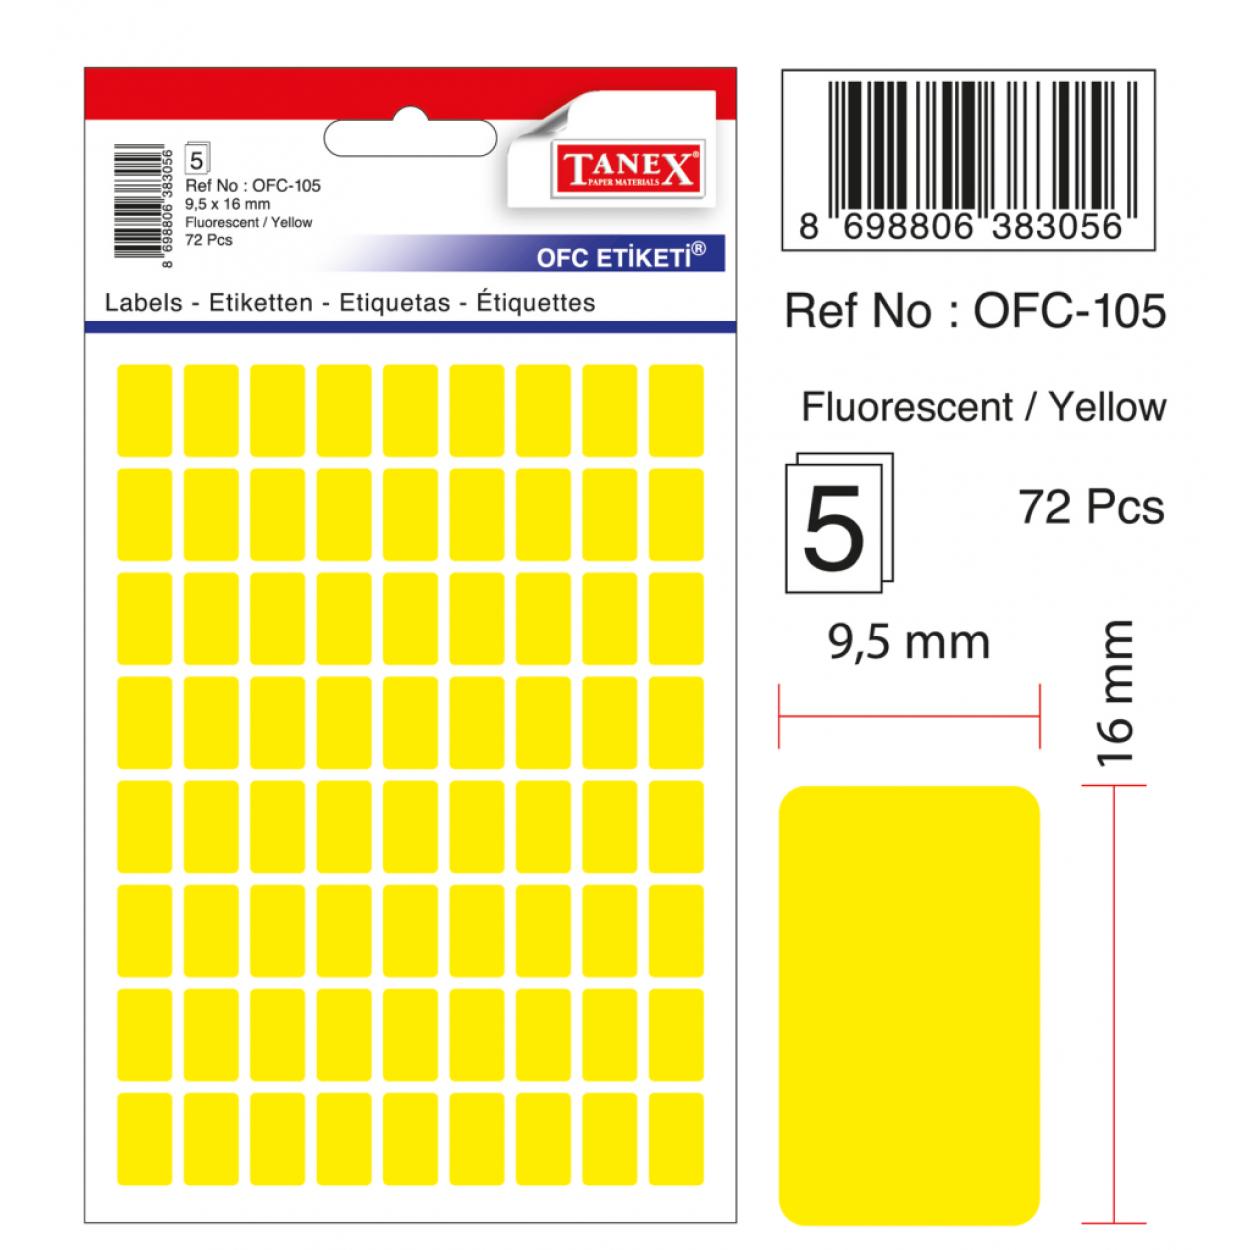 Tanex Ofc-105 Flo Sarı Ofis Etiketi